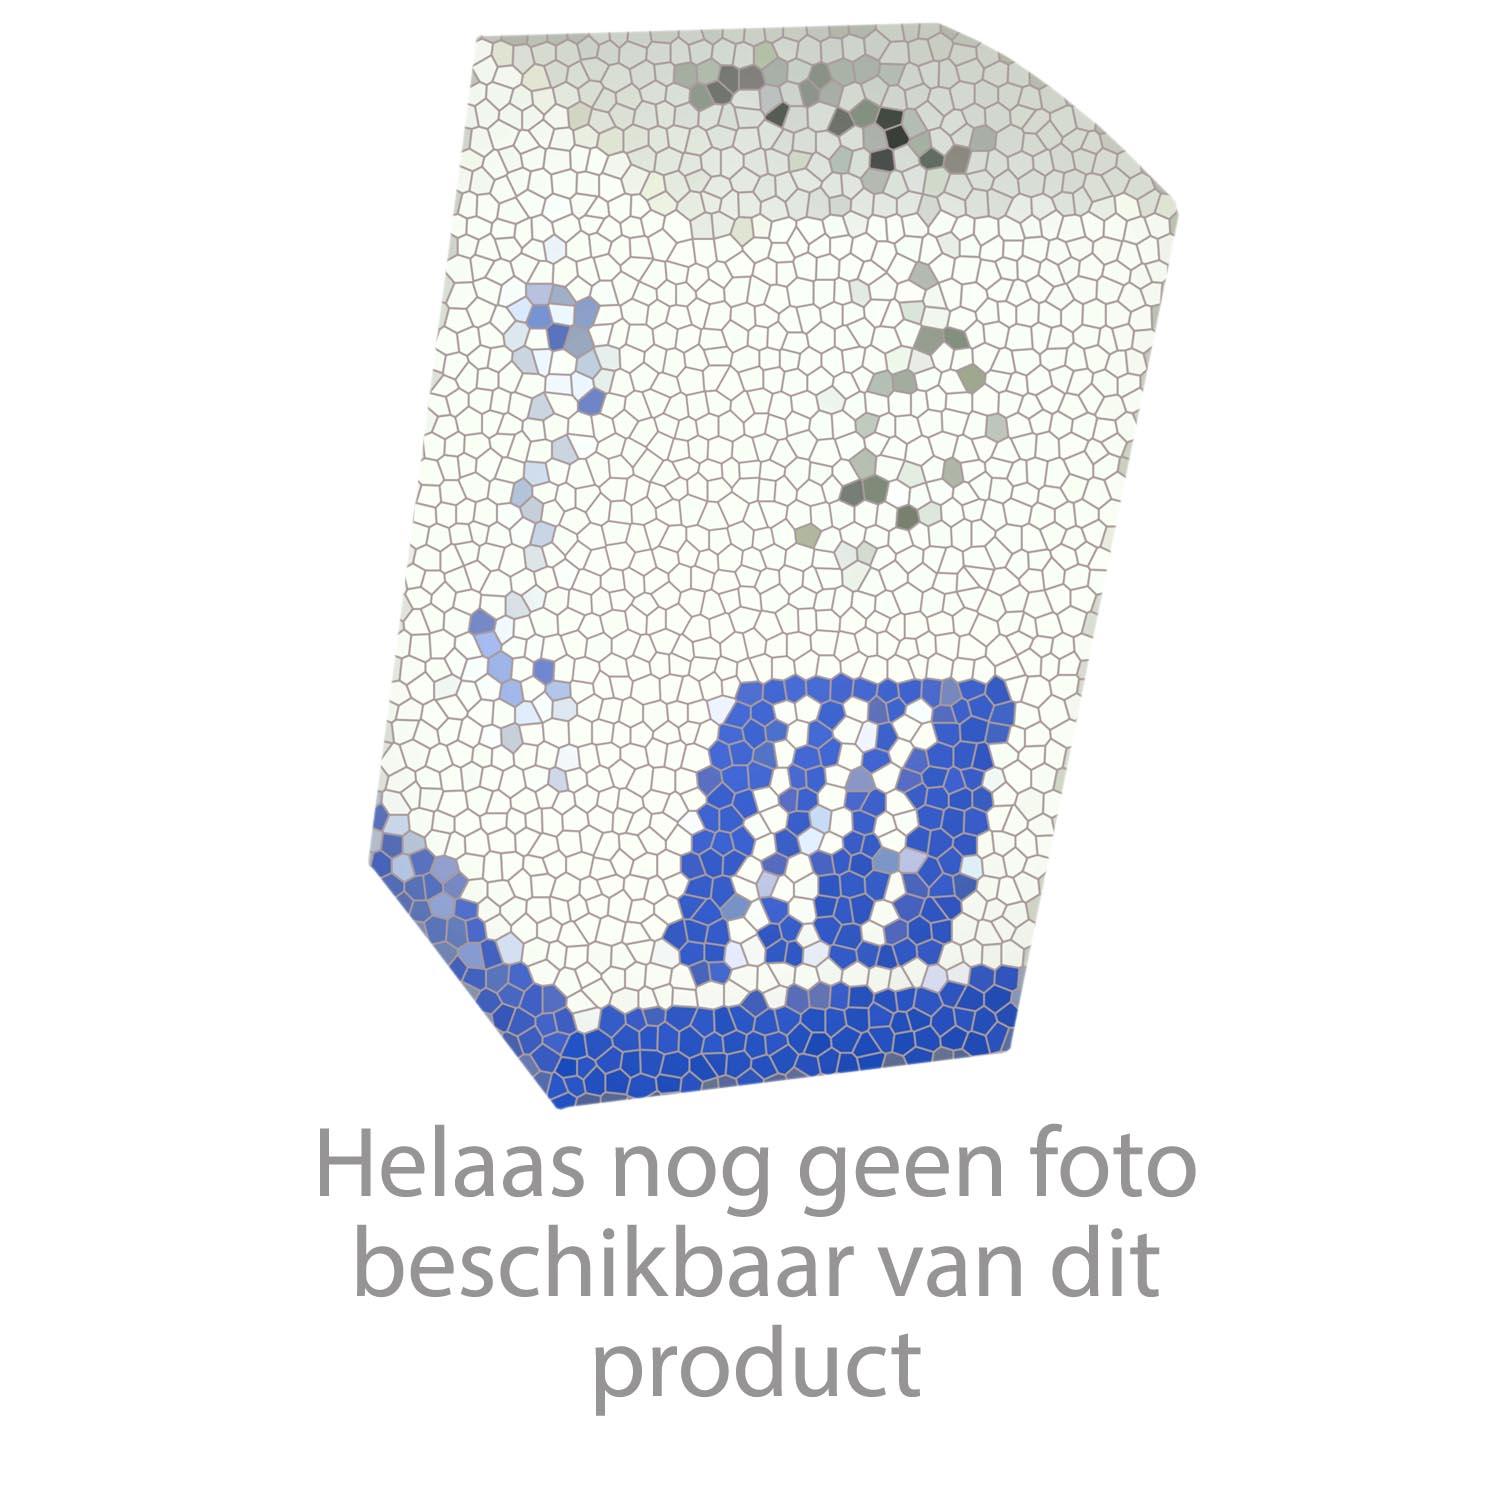 Grohe onderdelen Allure Brilliant 3-Gats Wastafelmengkraan Wand 172 Mm 20346000